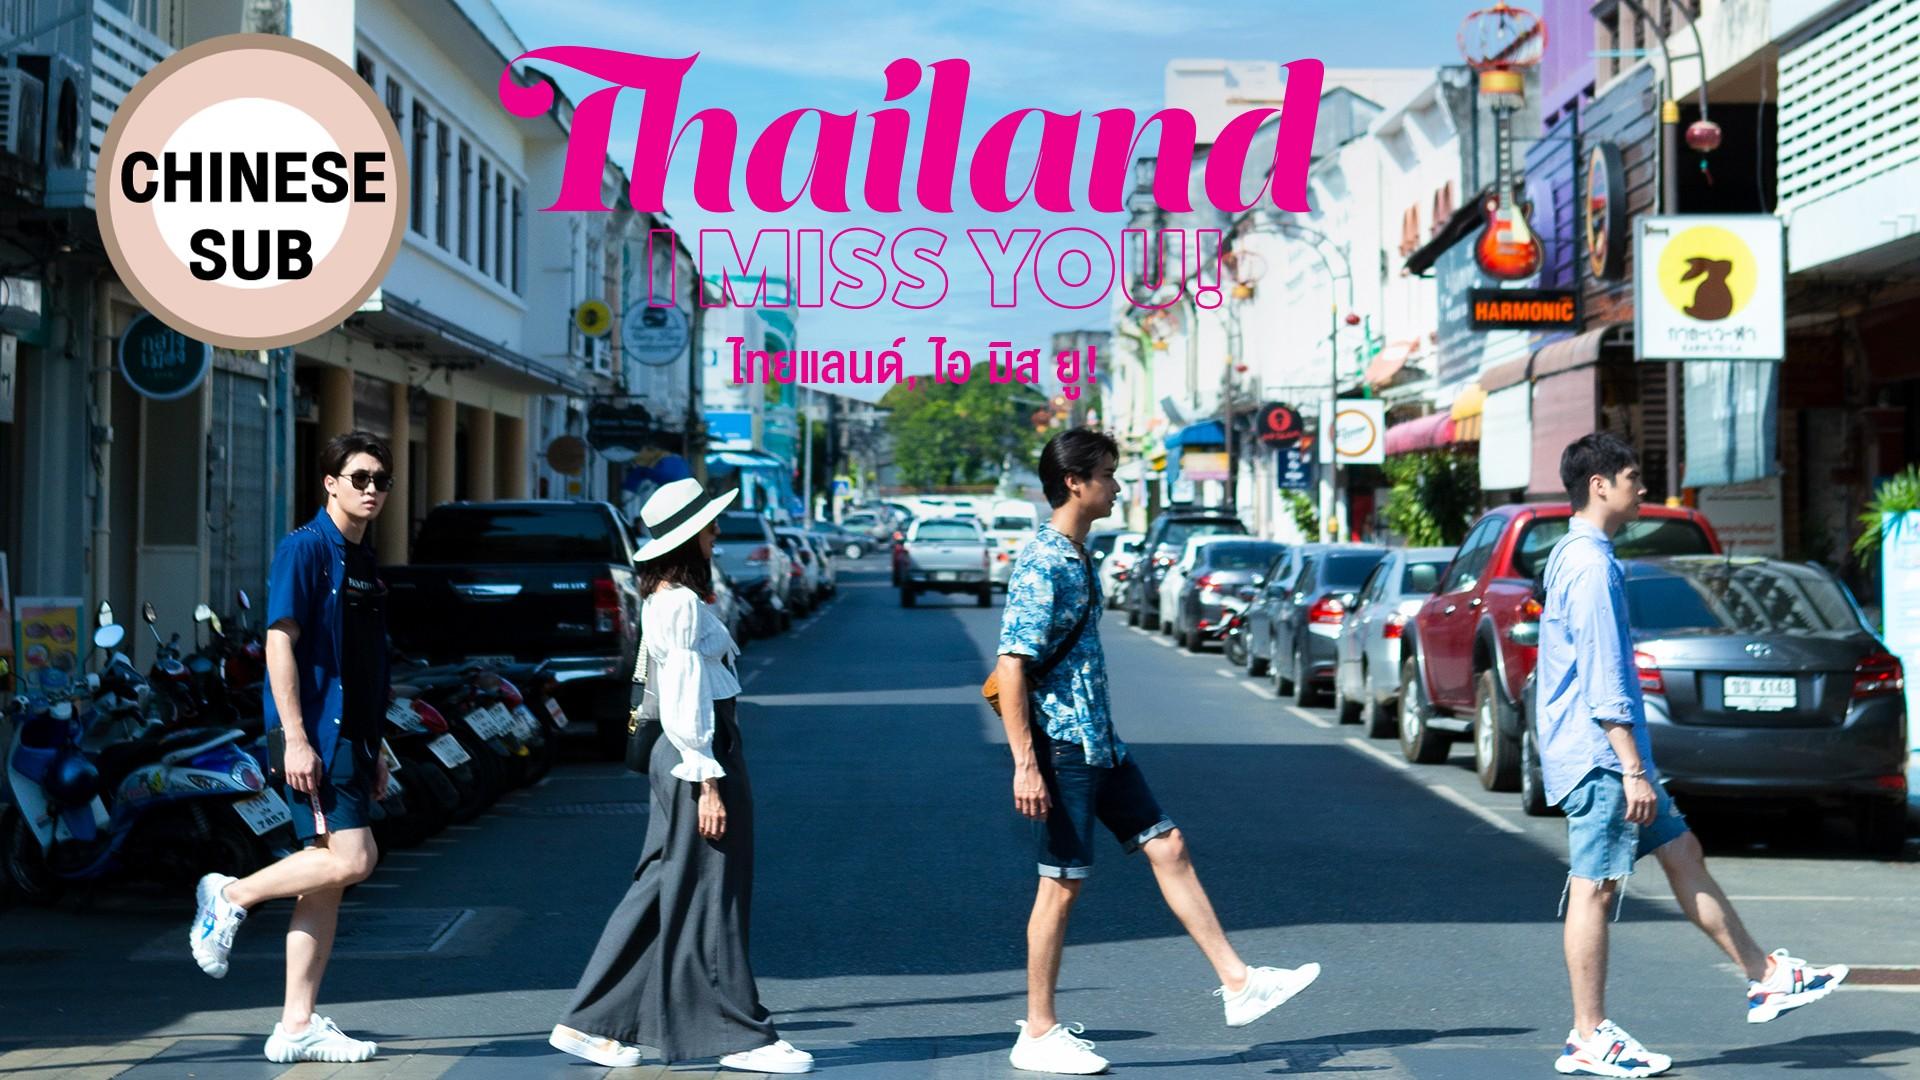 Thailand, I Miss You! [Chinese Sub]